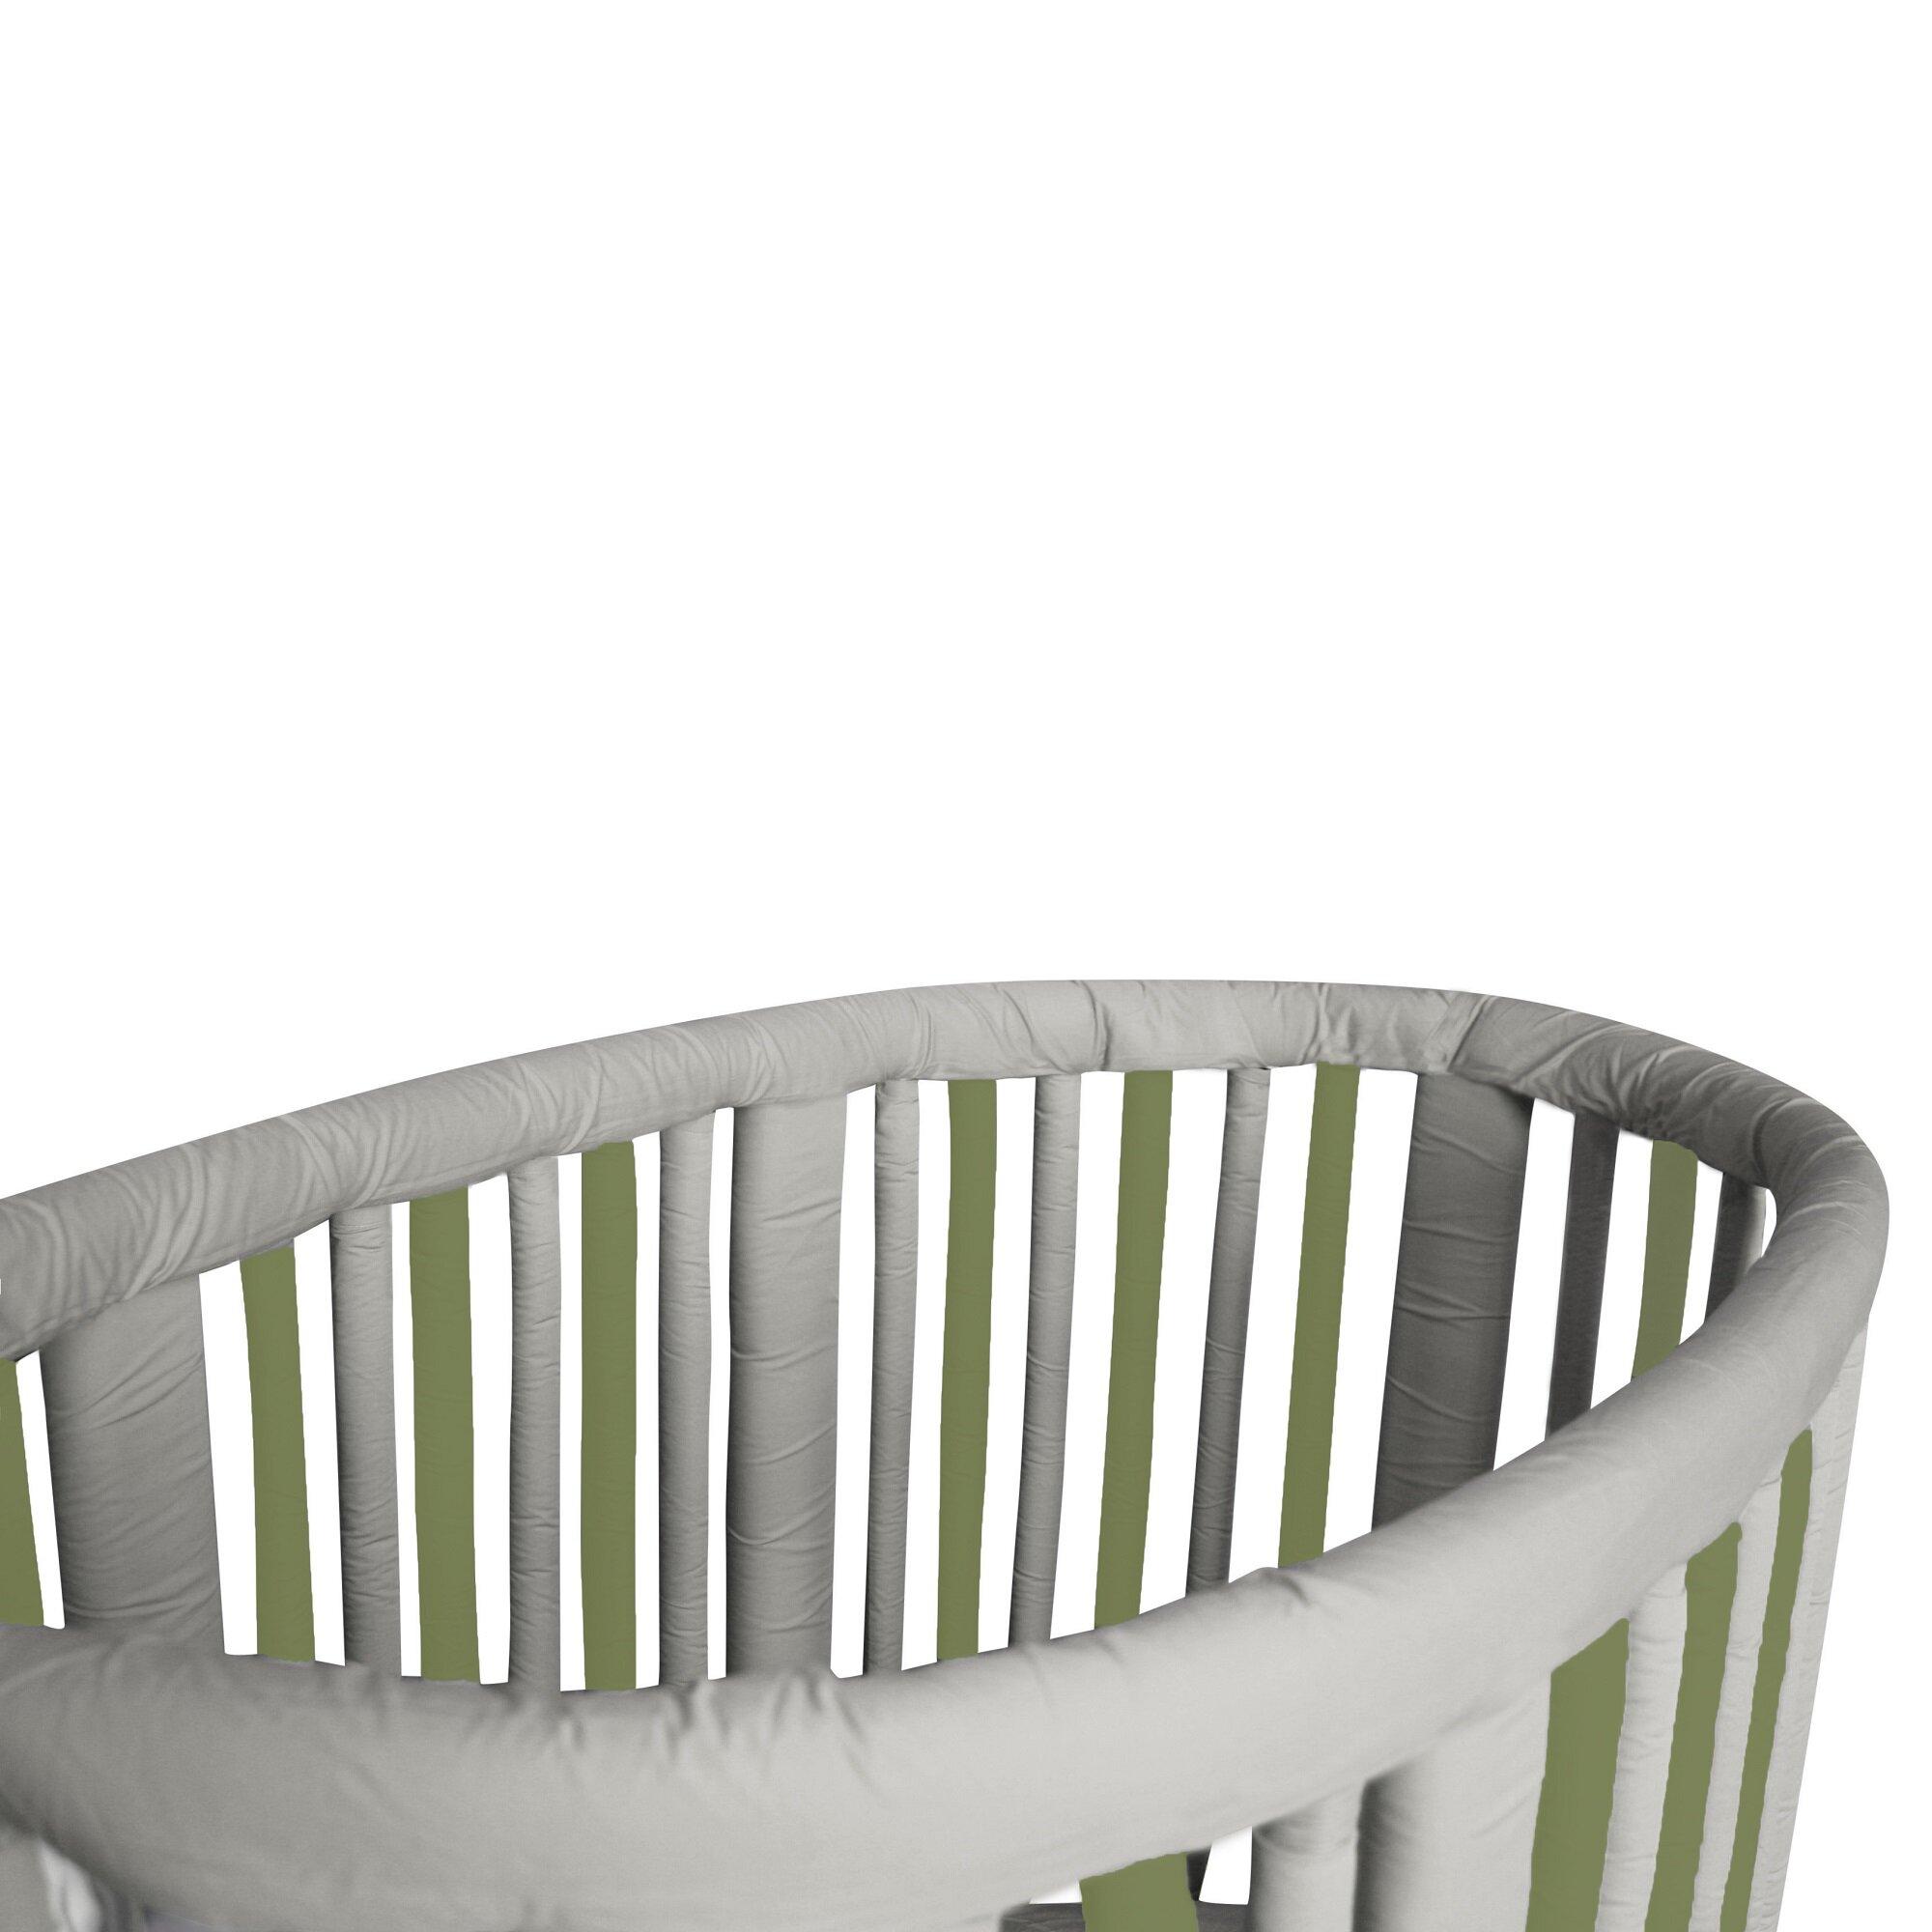 Crib rail for sale - Stokke Crib Rail Guard Cover